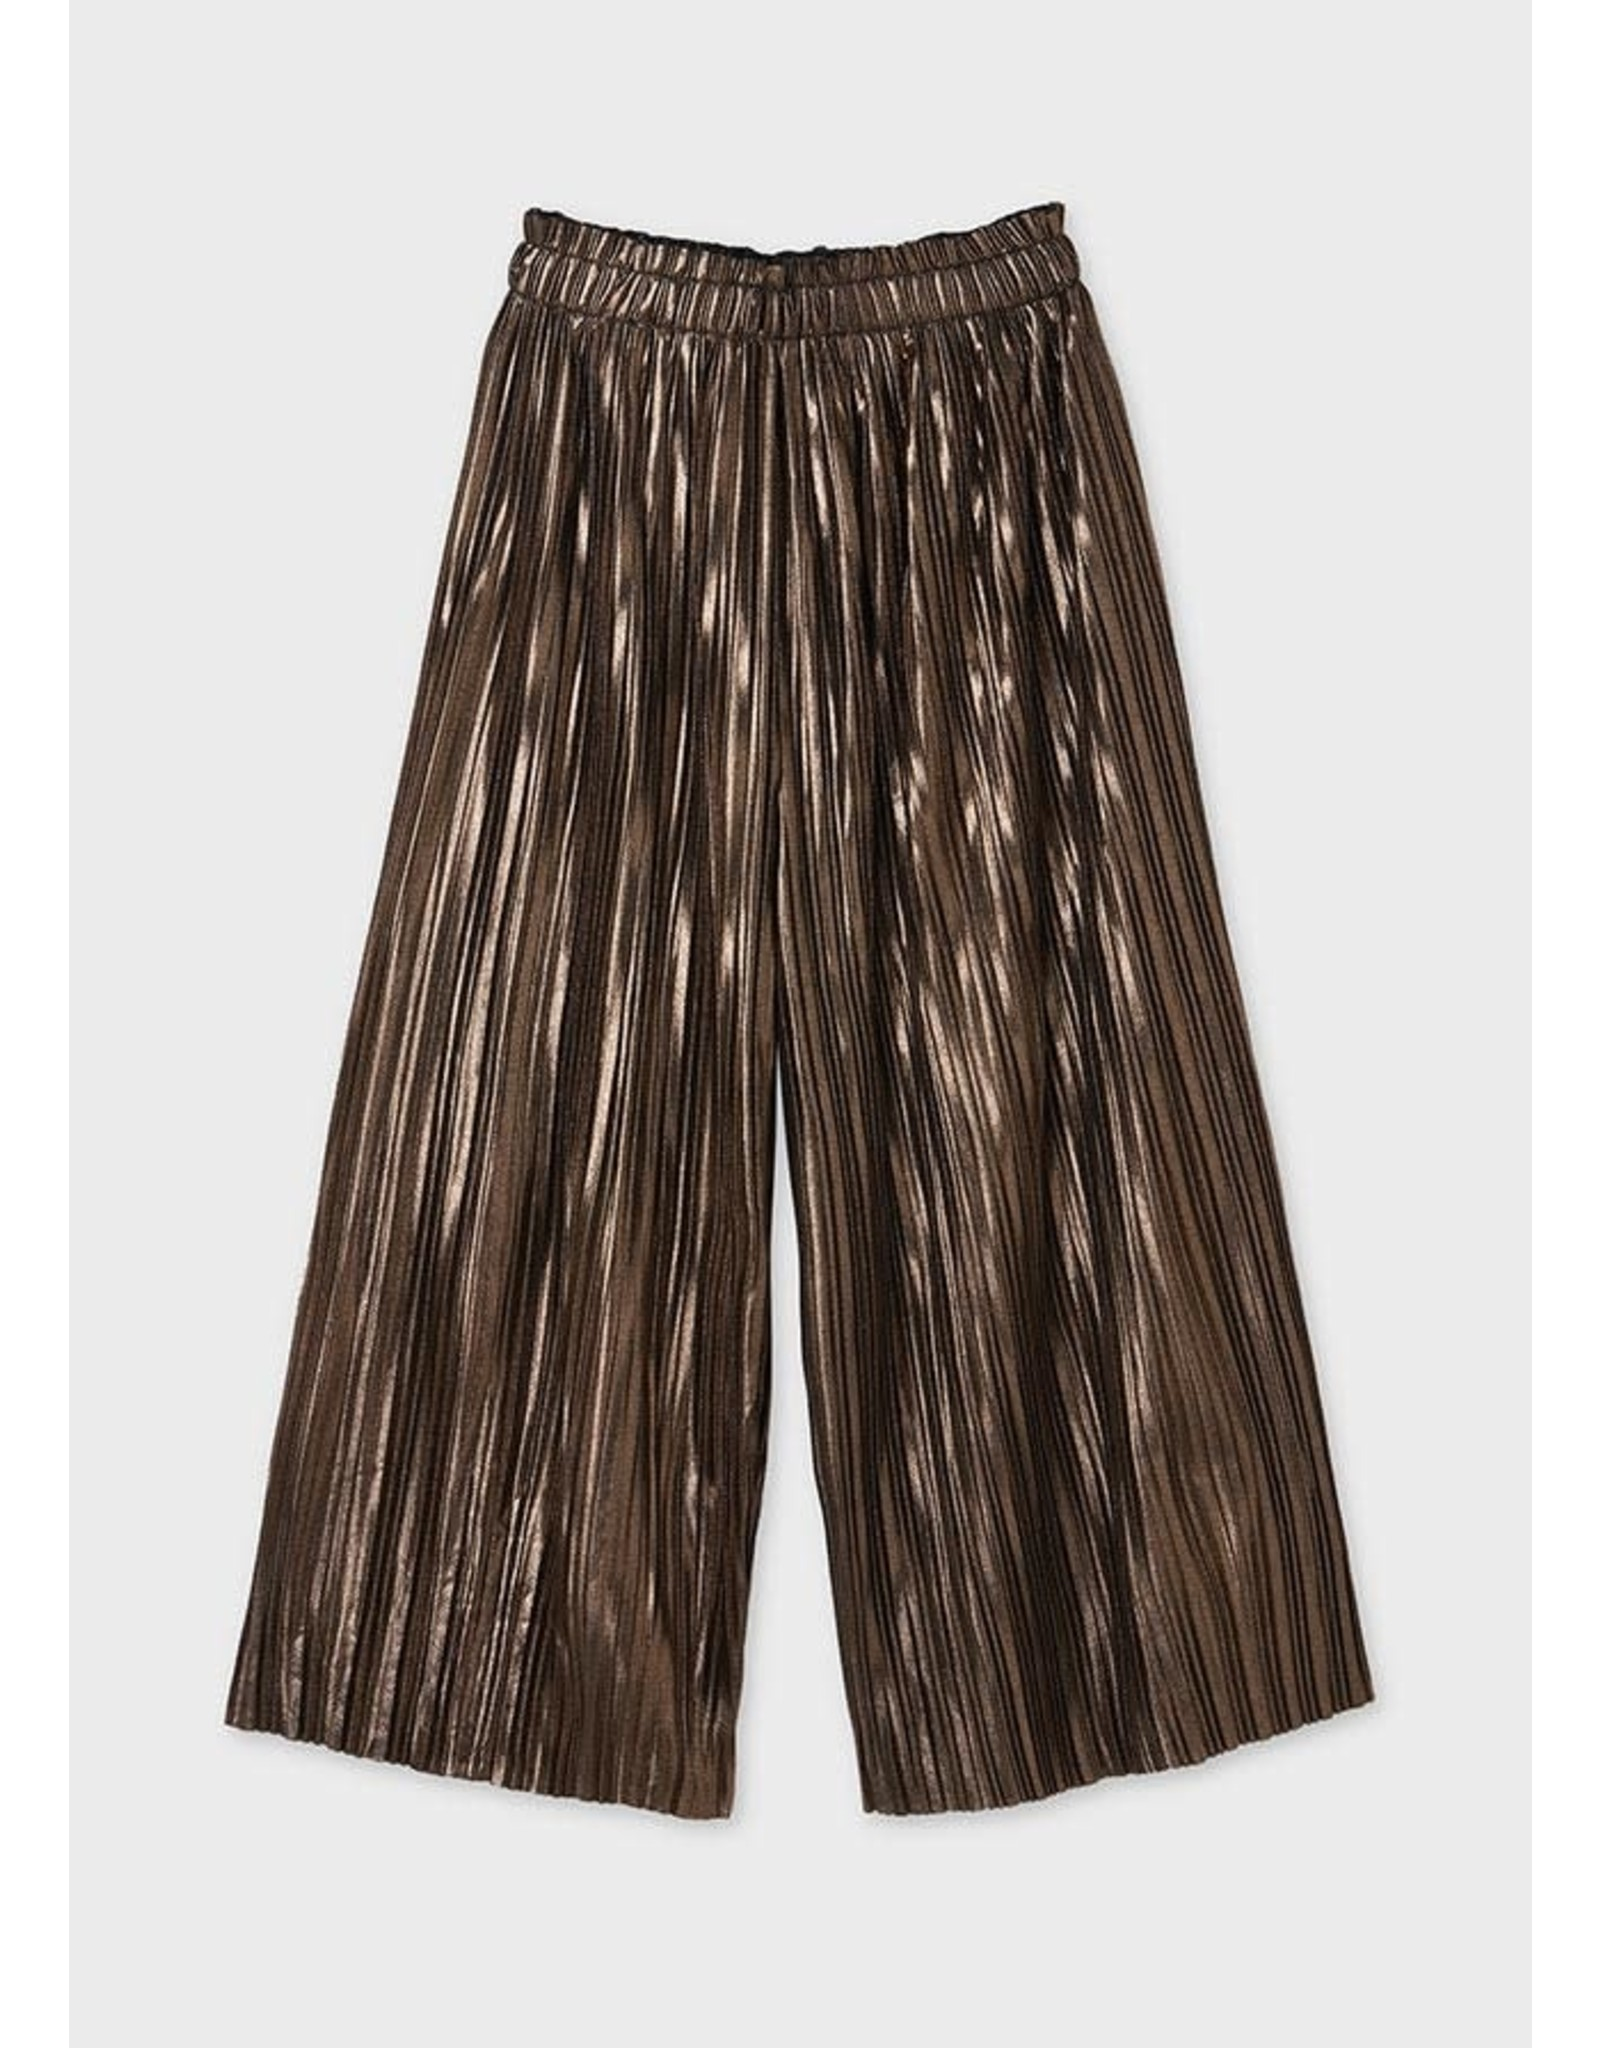 Mayoral Bronze Culotte Pants